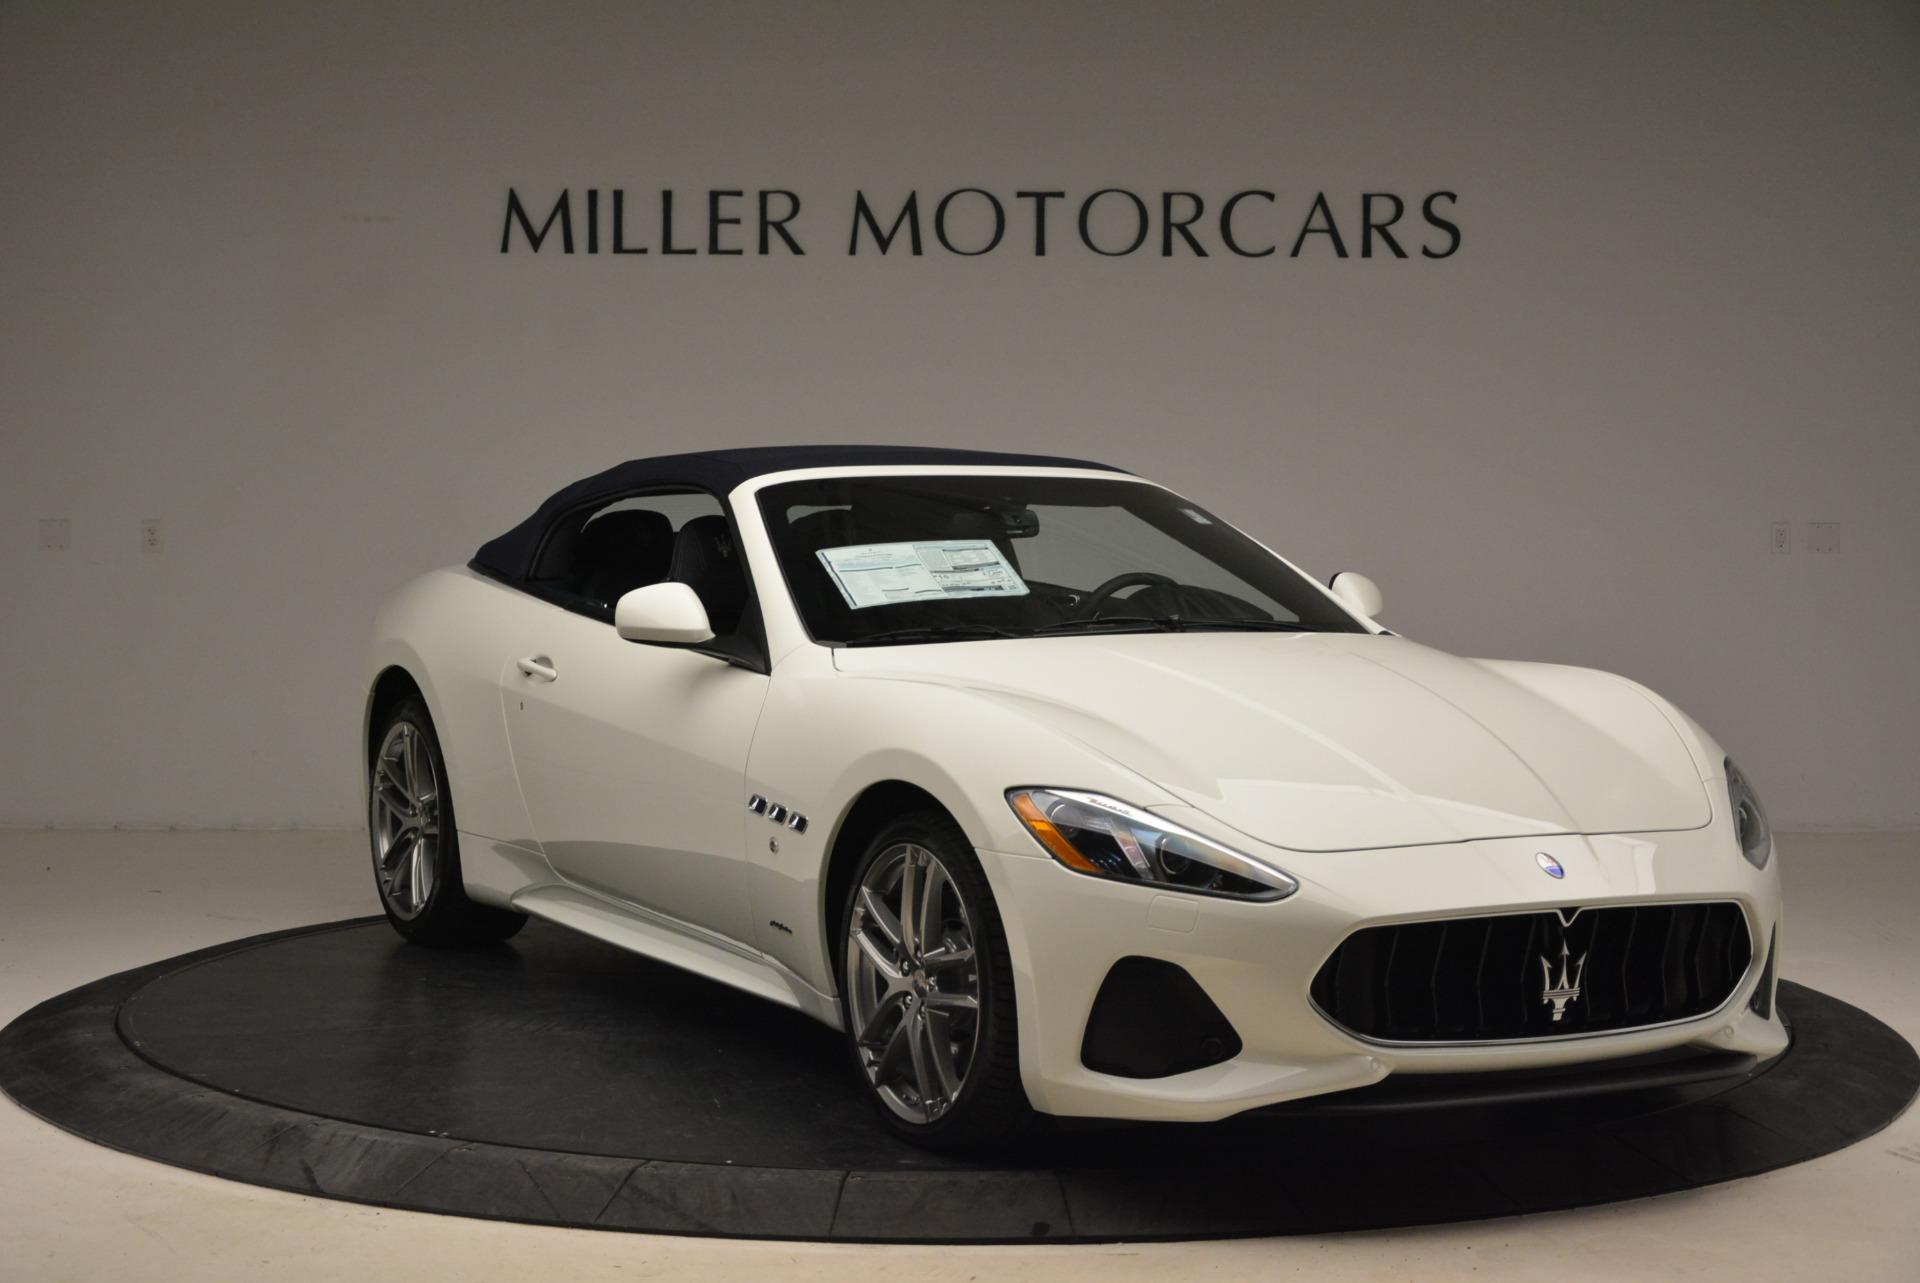 New 2018 Maserati GranTurismo Sport Convertible For Sale In Westport, CT 2120_p9